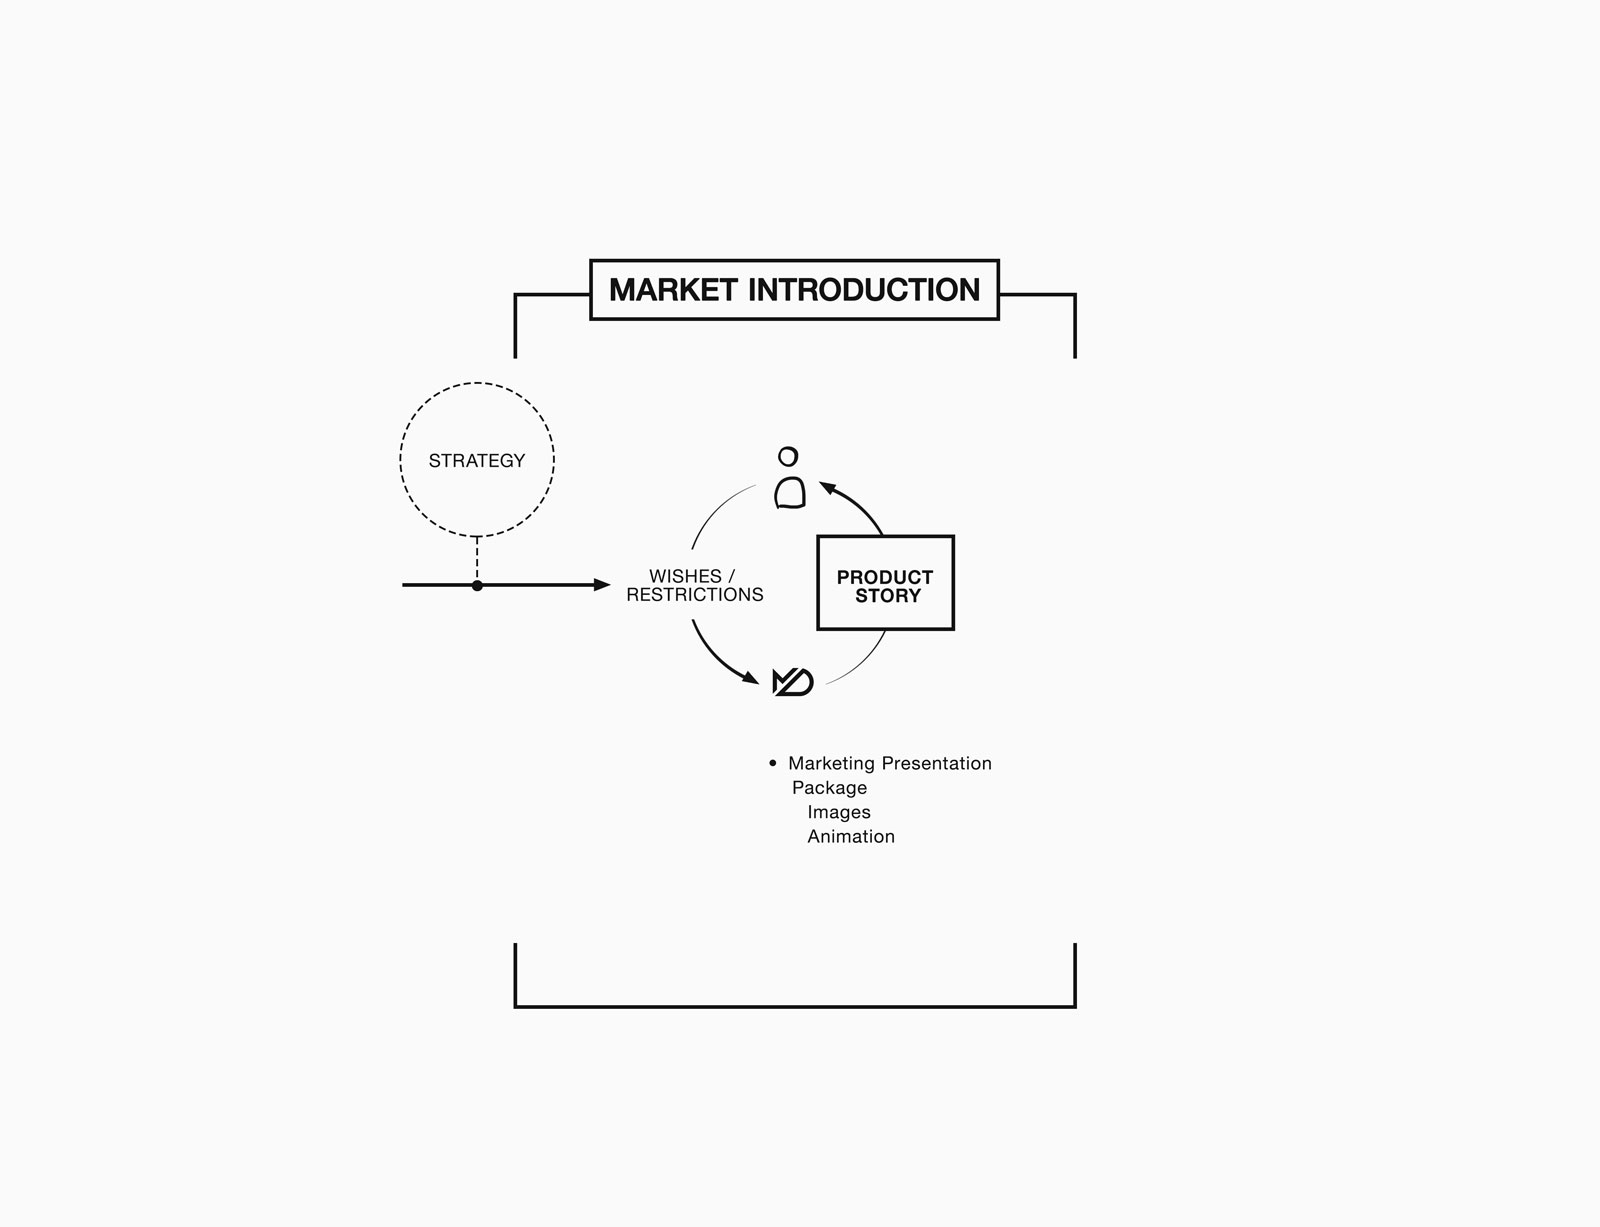 Matevo_Design_Process_5.jpg